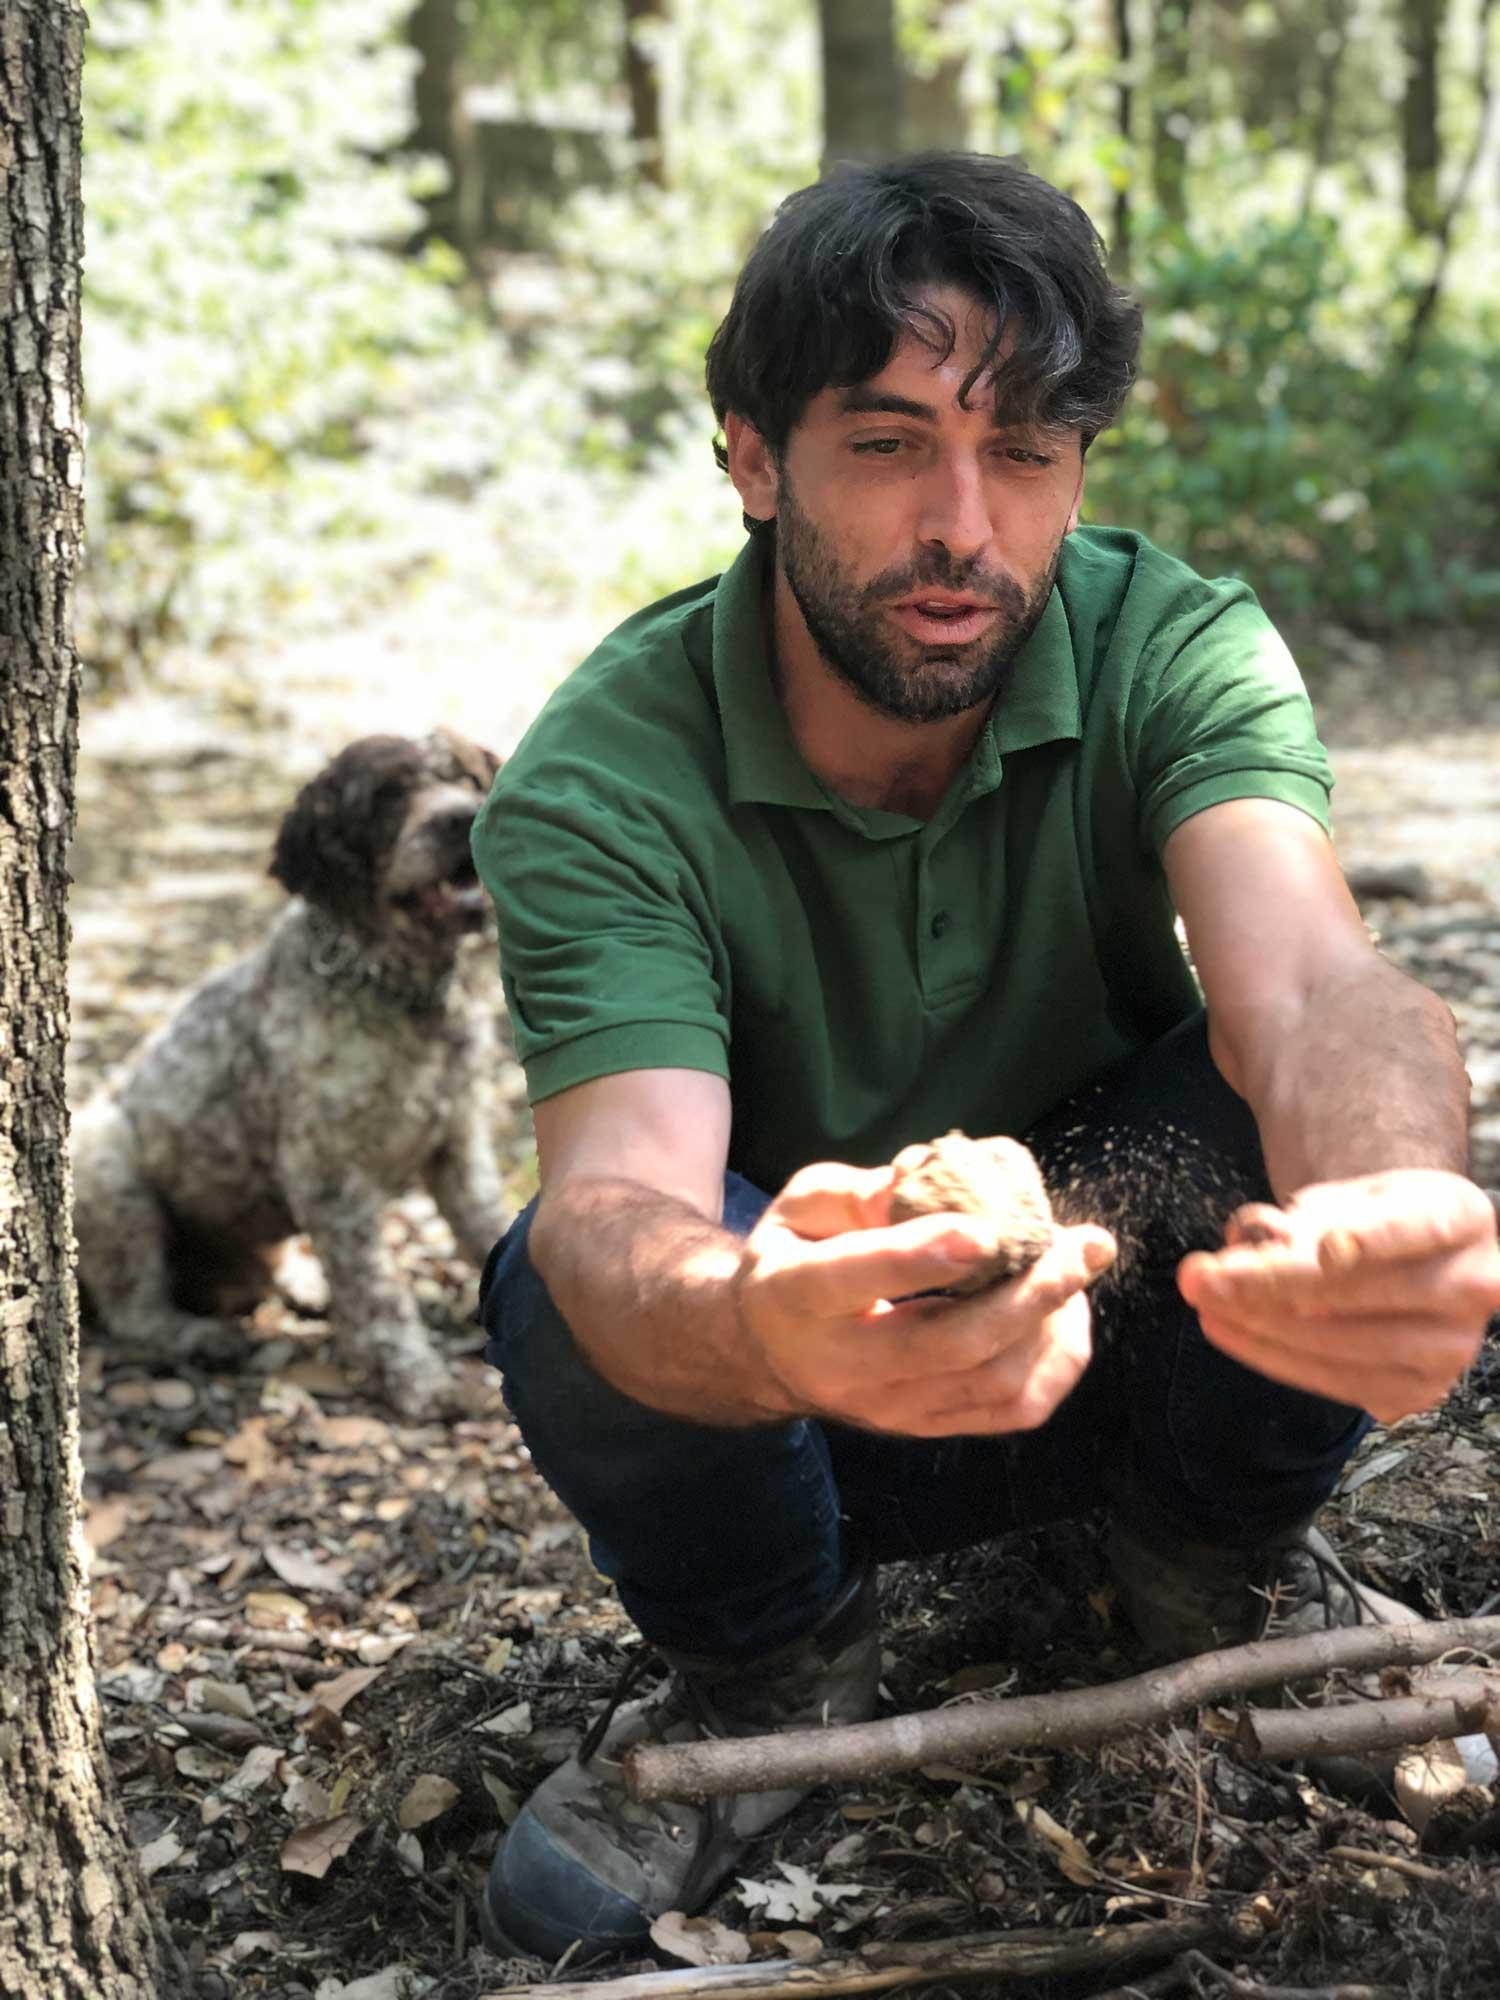 Truffle hunter Italian Truffle hunting dog finding truffles Tuscany tour